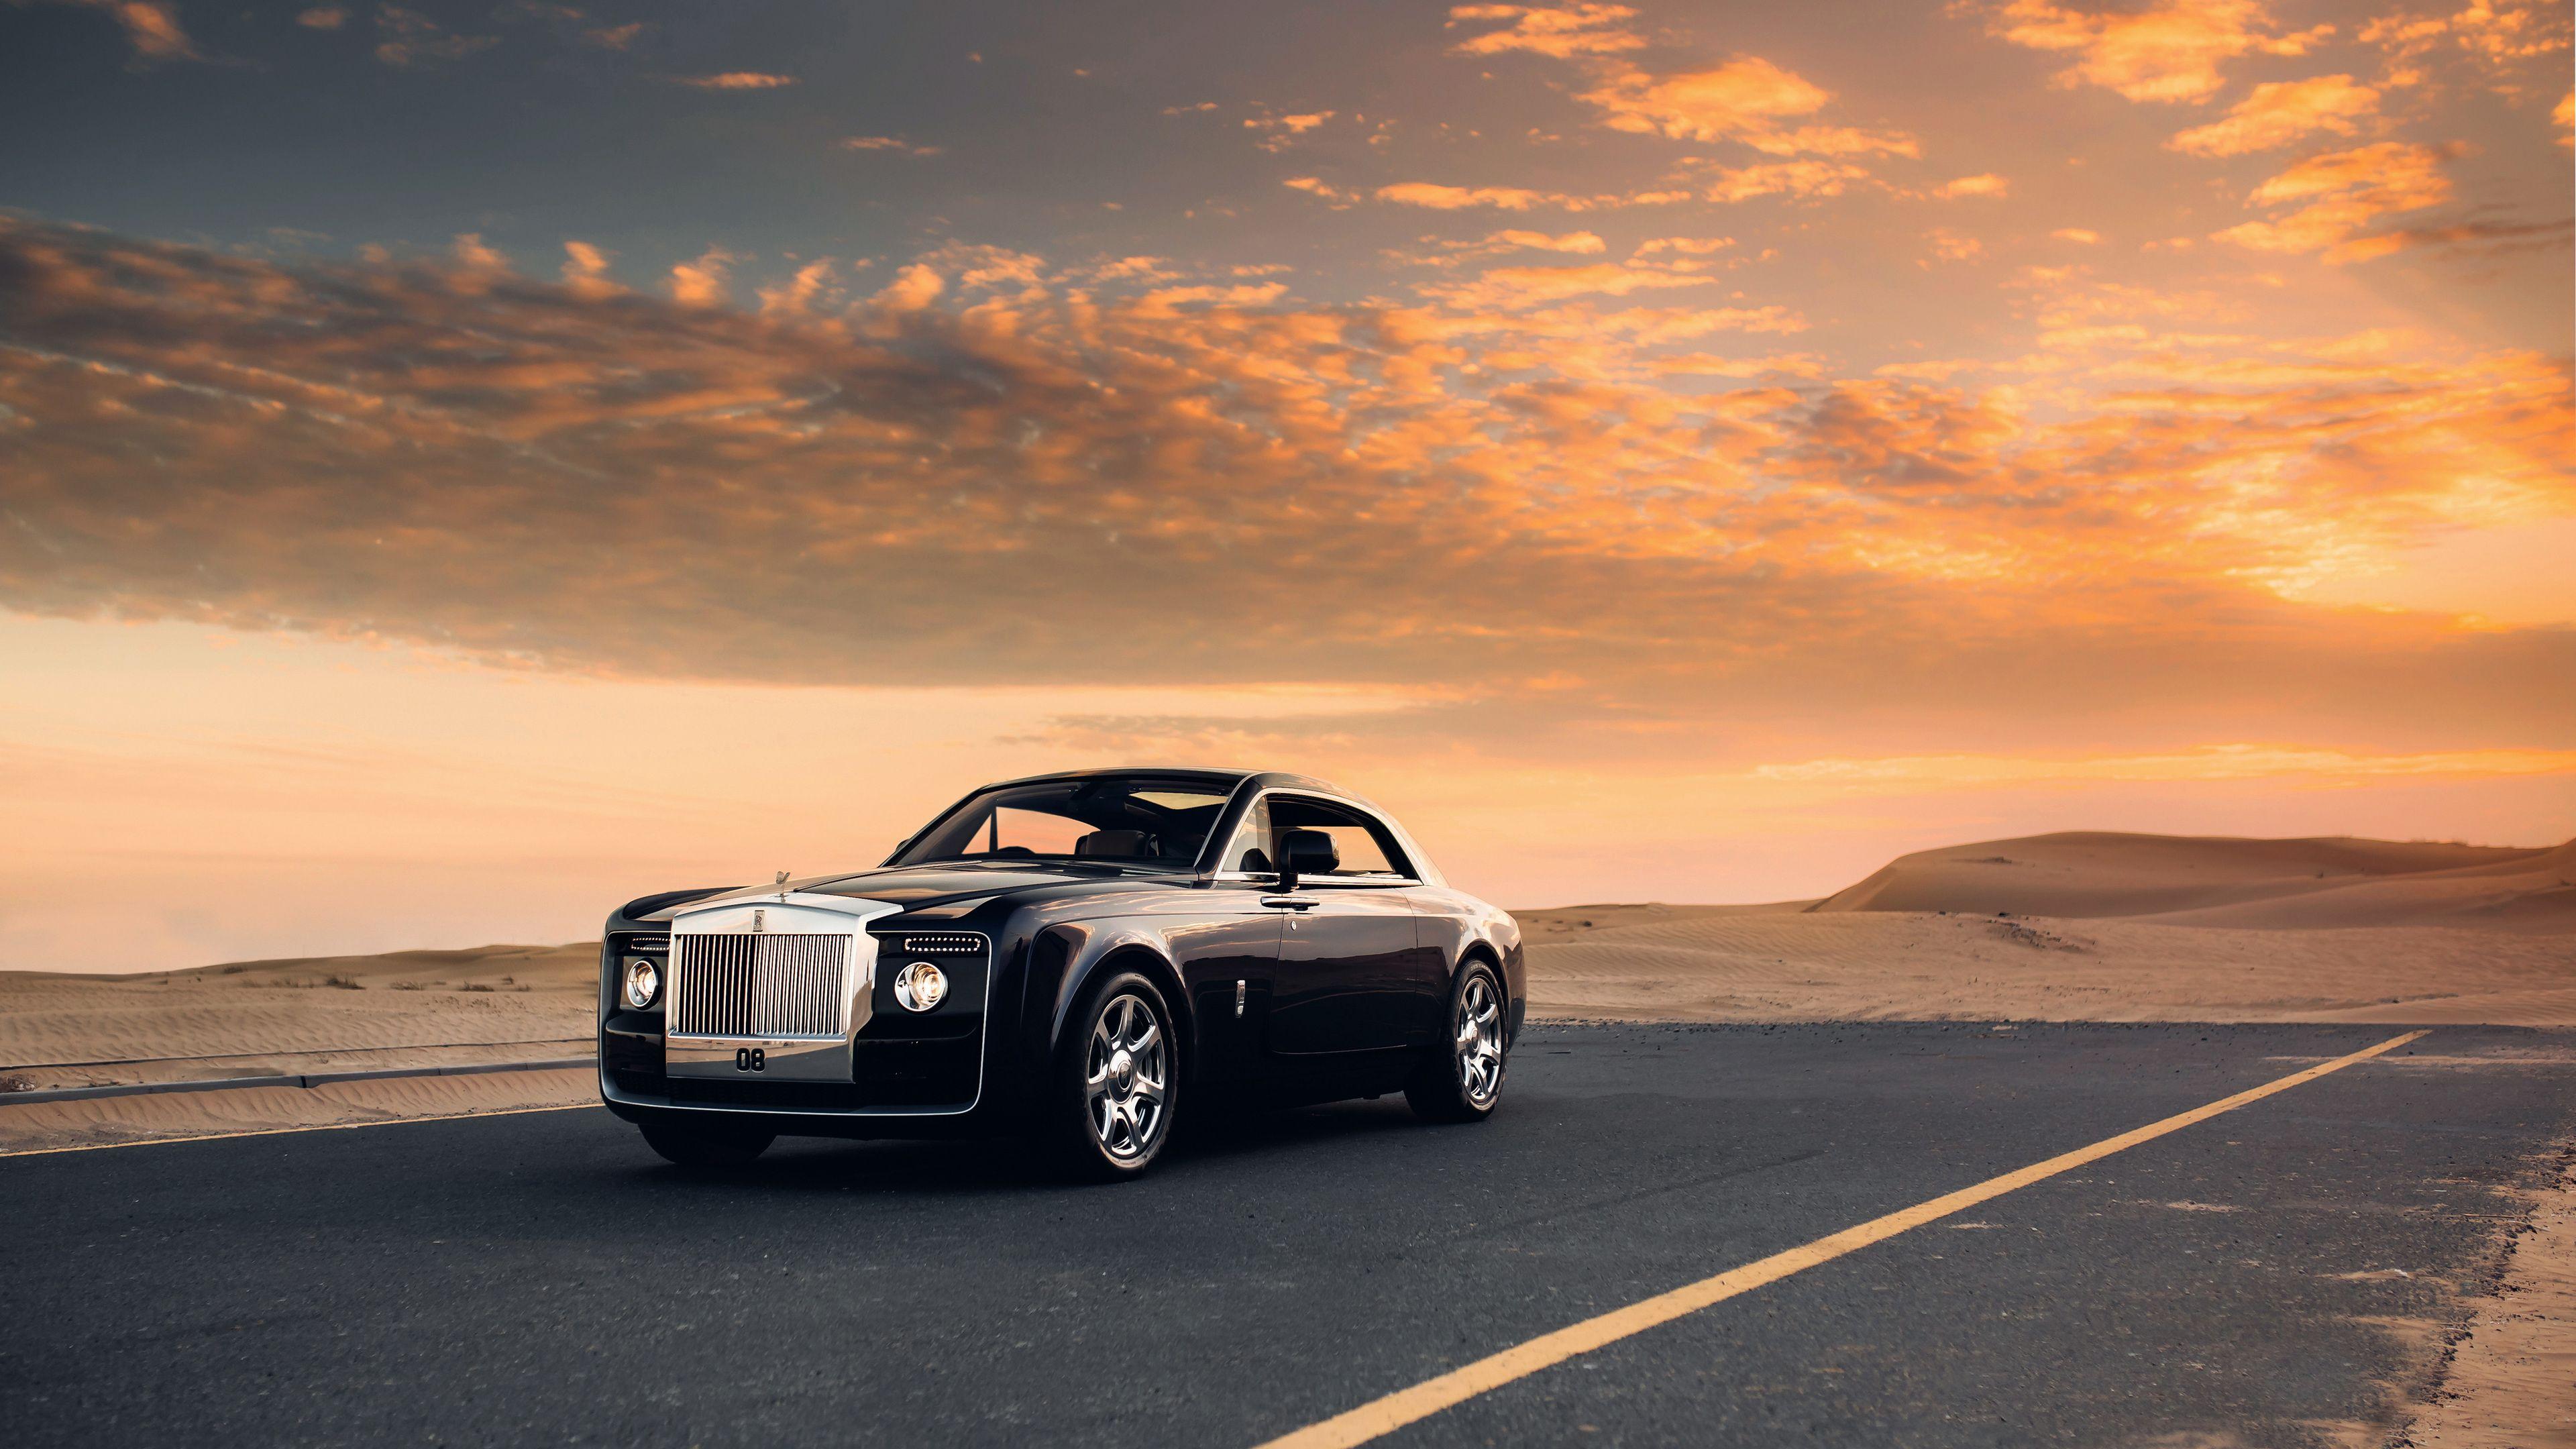 Wallpaper 4k Rolls Royce Sweptail Car 2017 cars wallpapers 4k 3840x2160